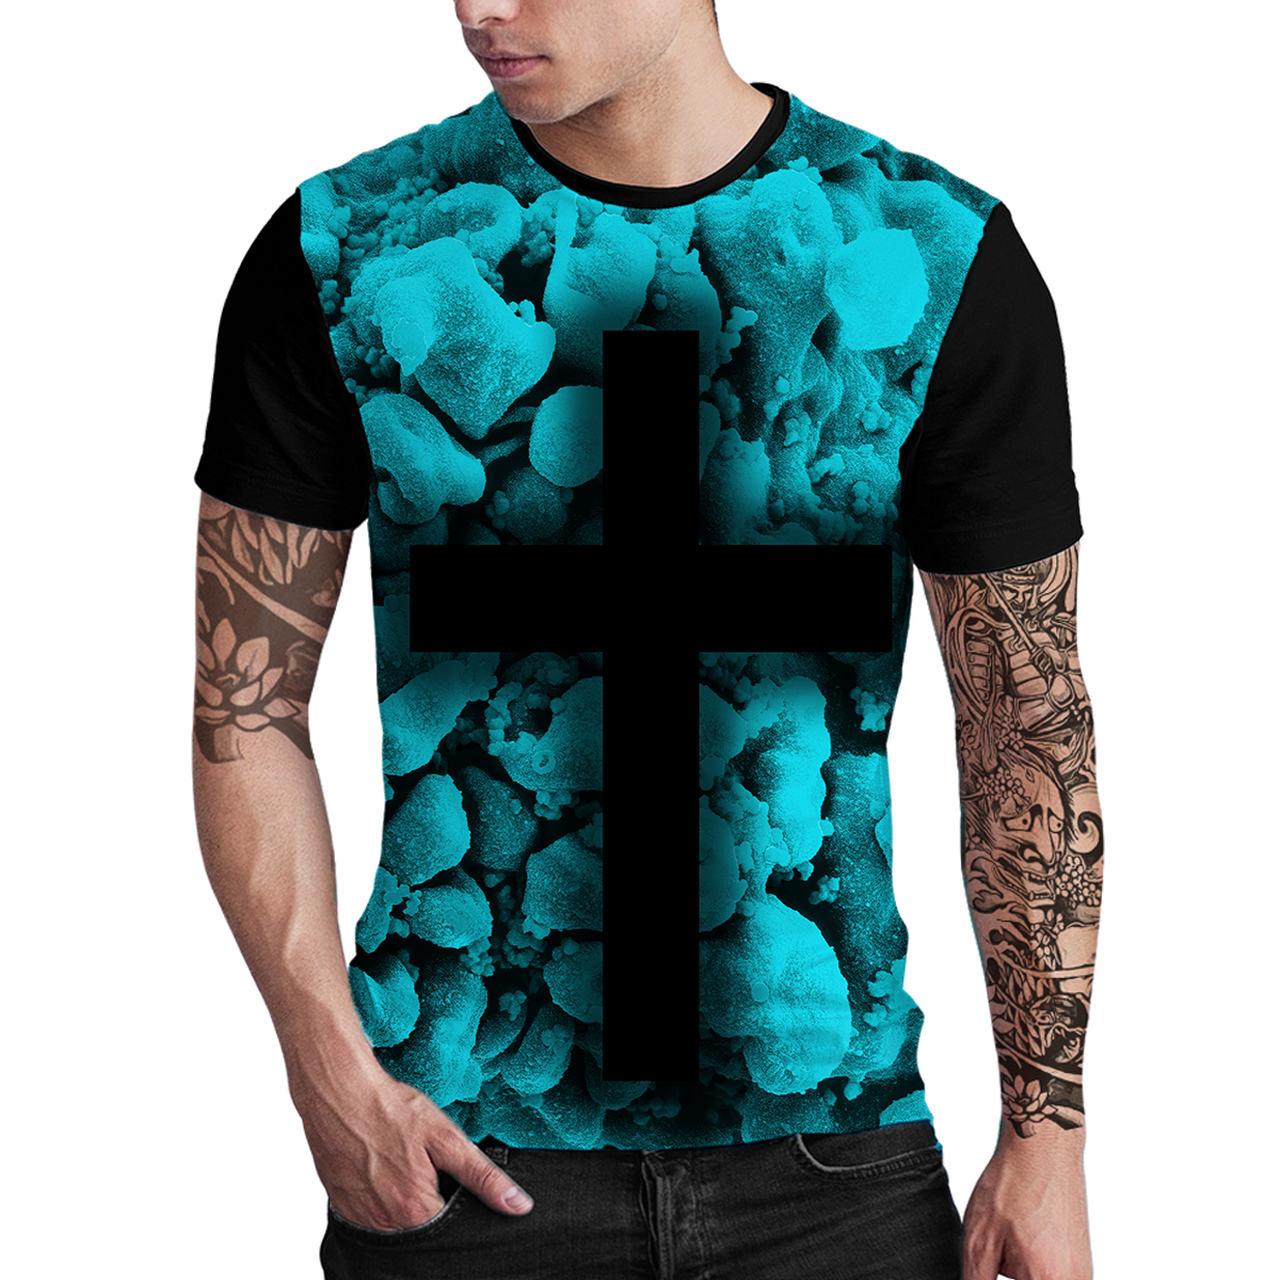 Stompy Camiseta Estampada Masculina Modelo 05